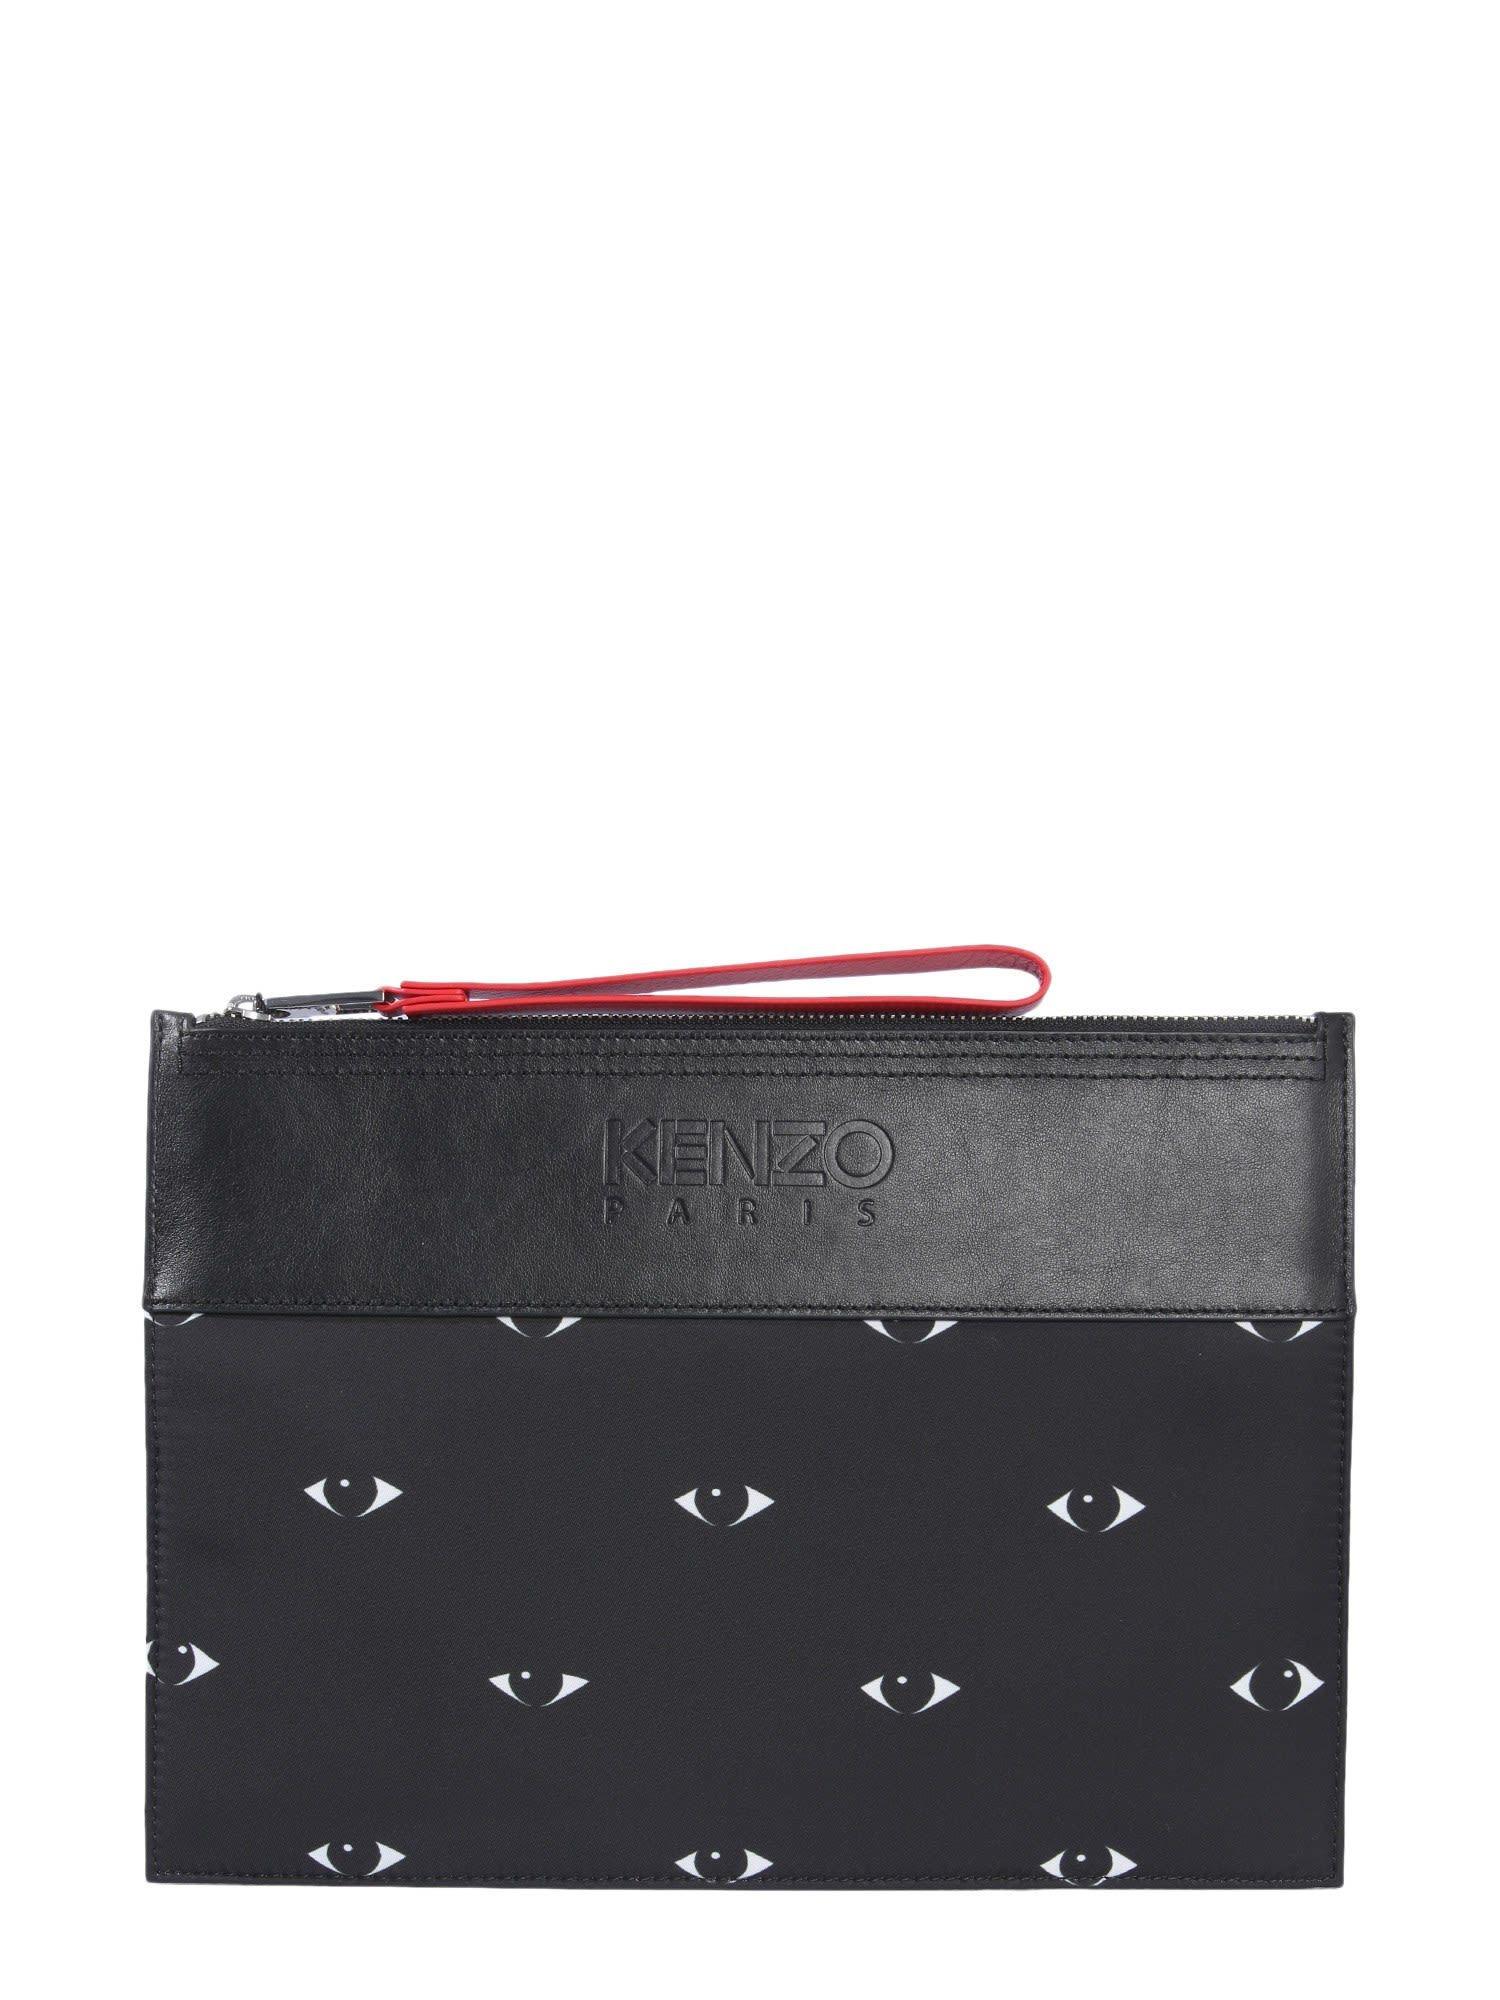 786f4cb2c6 KENZO MULTI EYE A4 CLUTCH. #kenzo #bags #clutch #polyester #hand ...